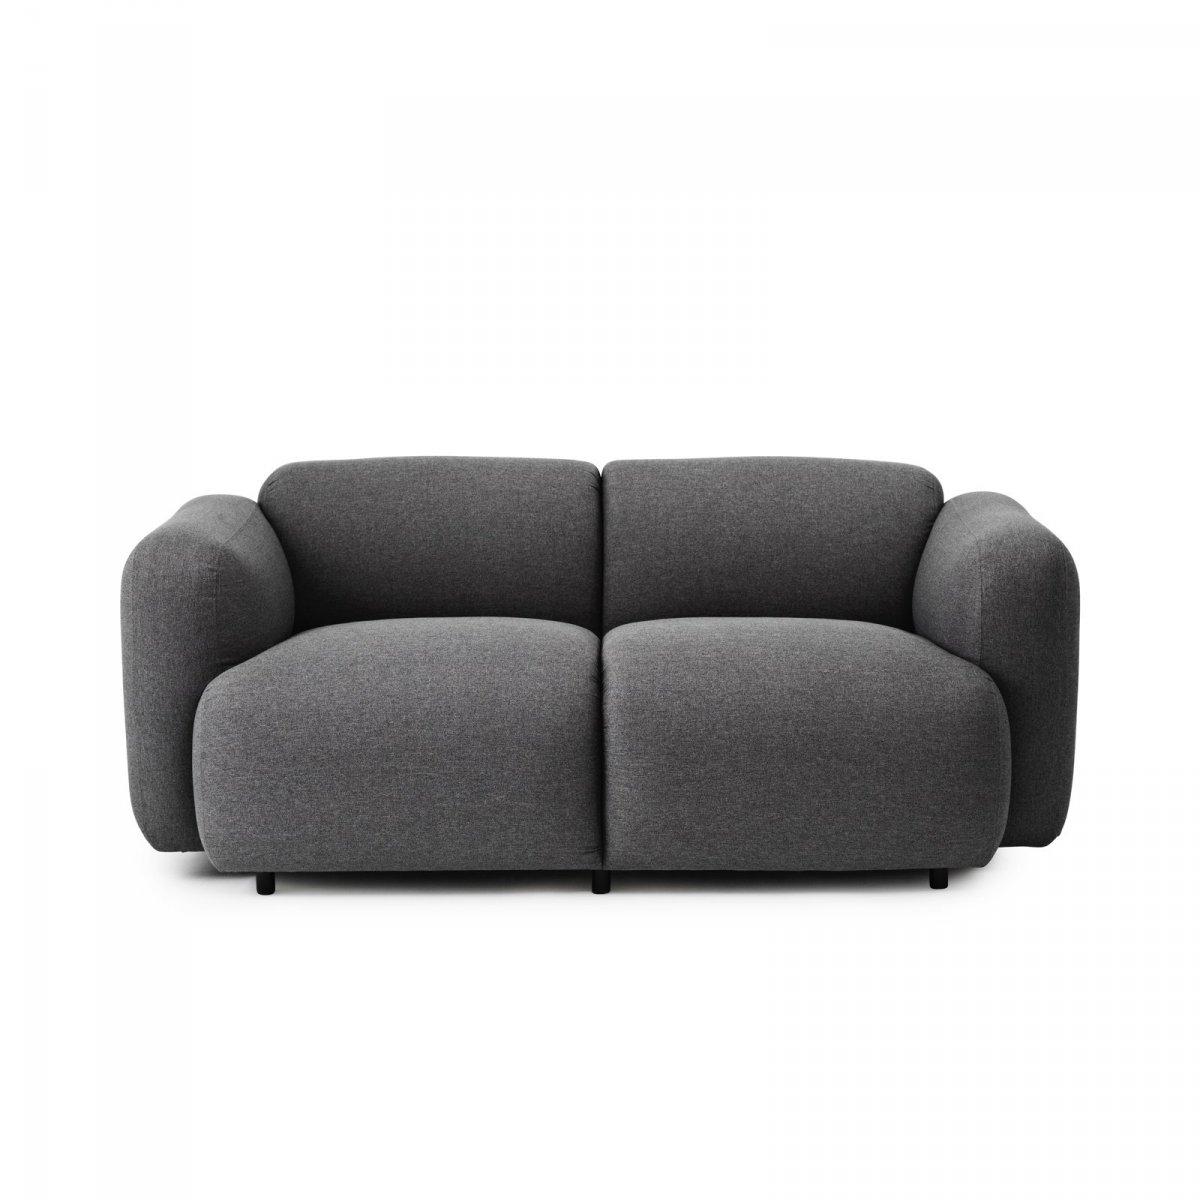 Swell Sofa 2 Seater.